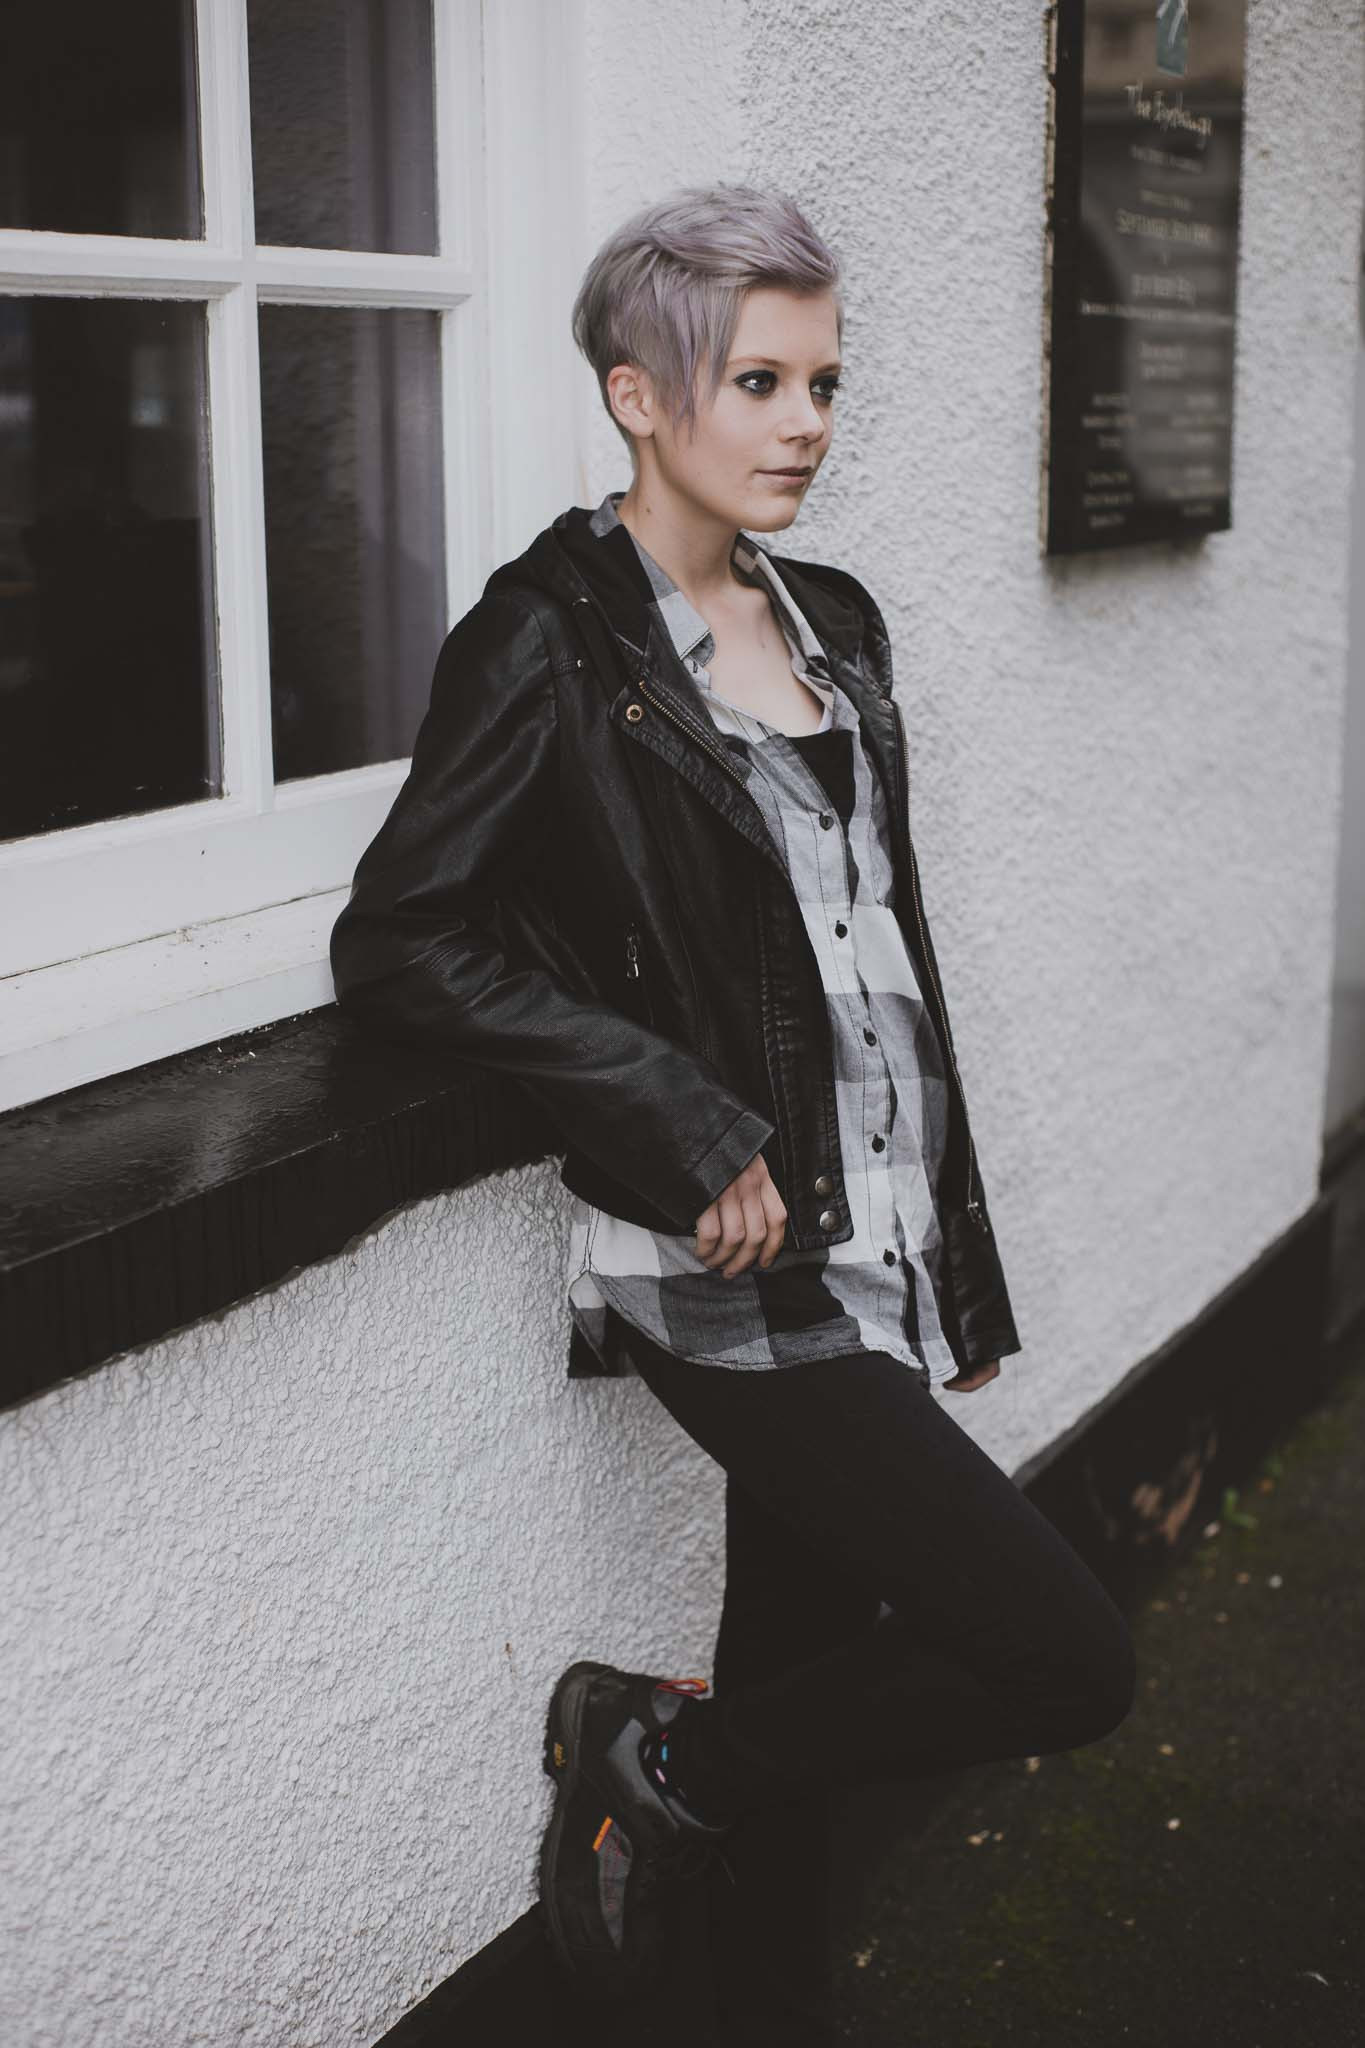 fashion commercial photography base kingsbridge Emma Vincent Photography-1101.jpg